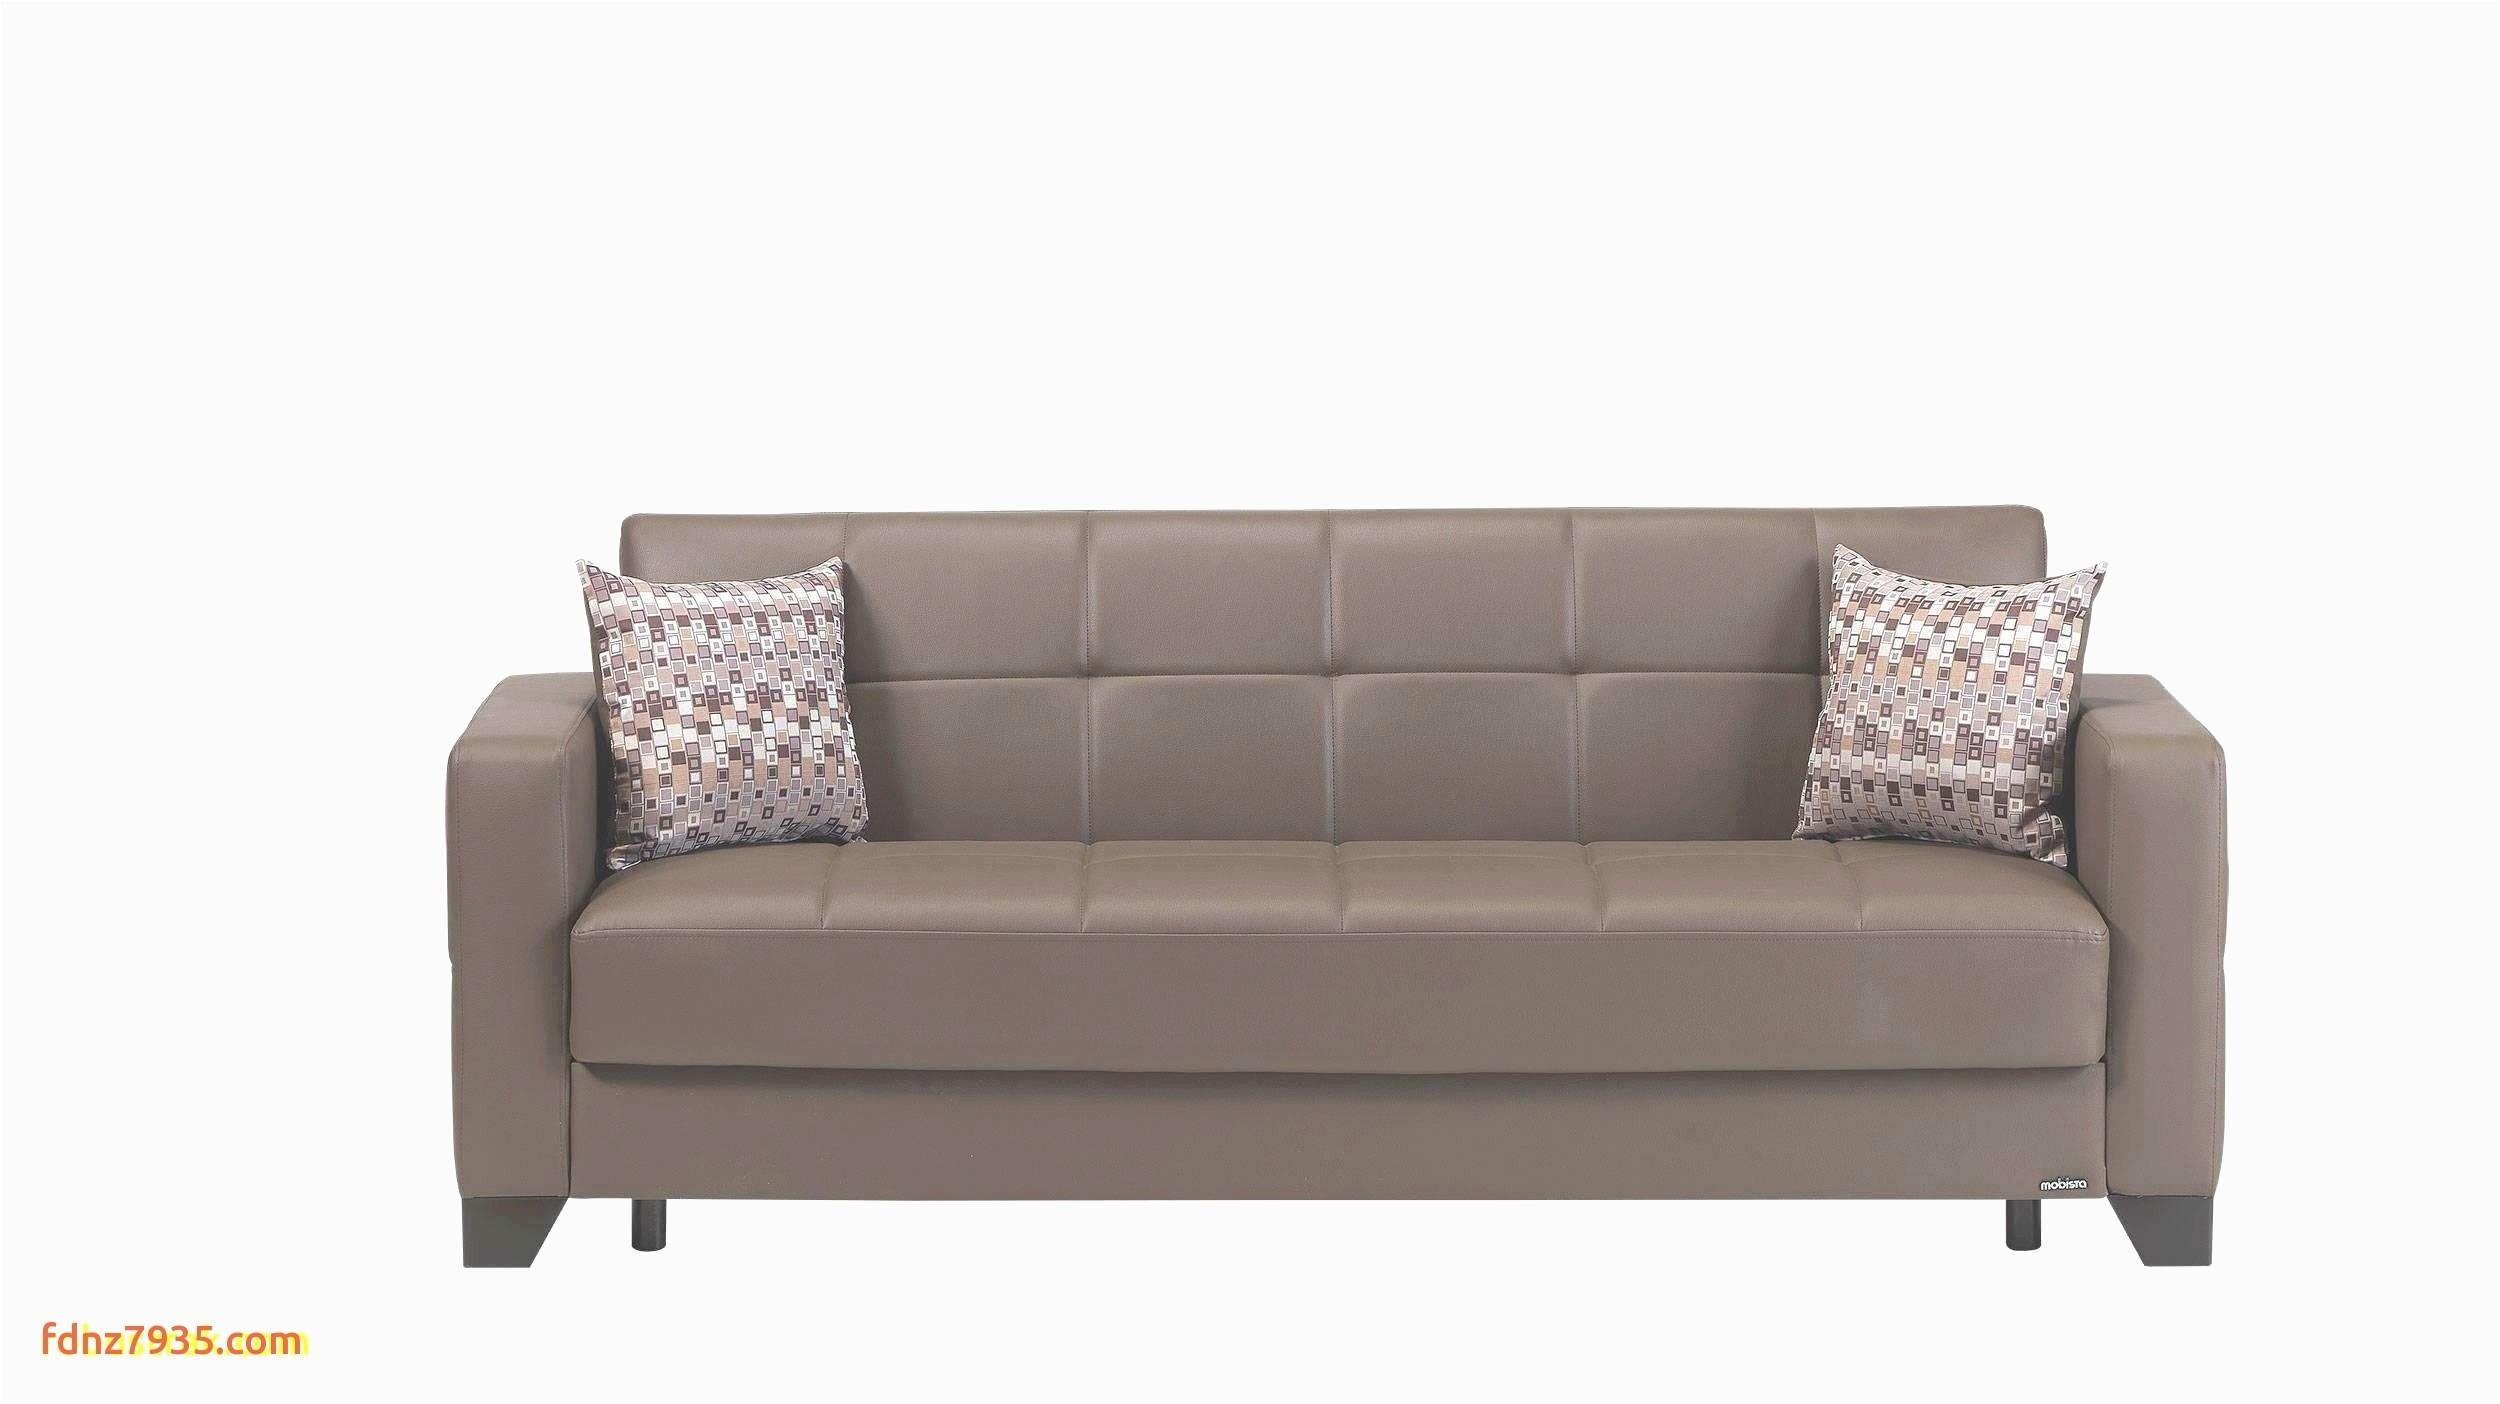 bobs furniture couches elegant bobs sectional sofa fresh sofa design